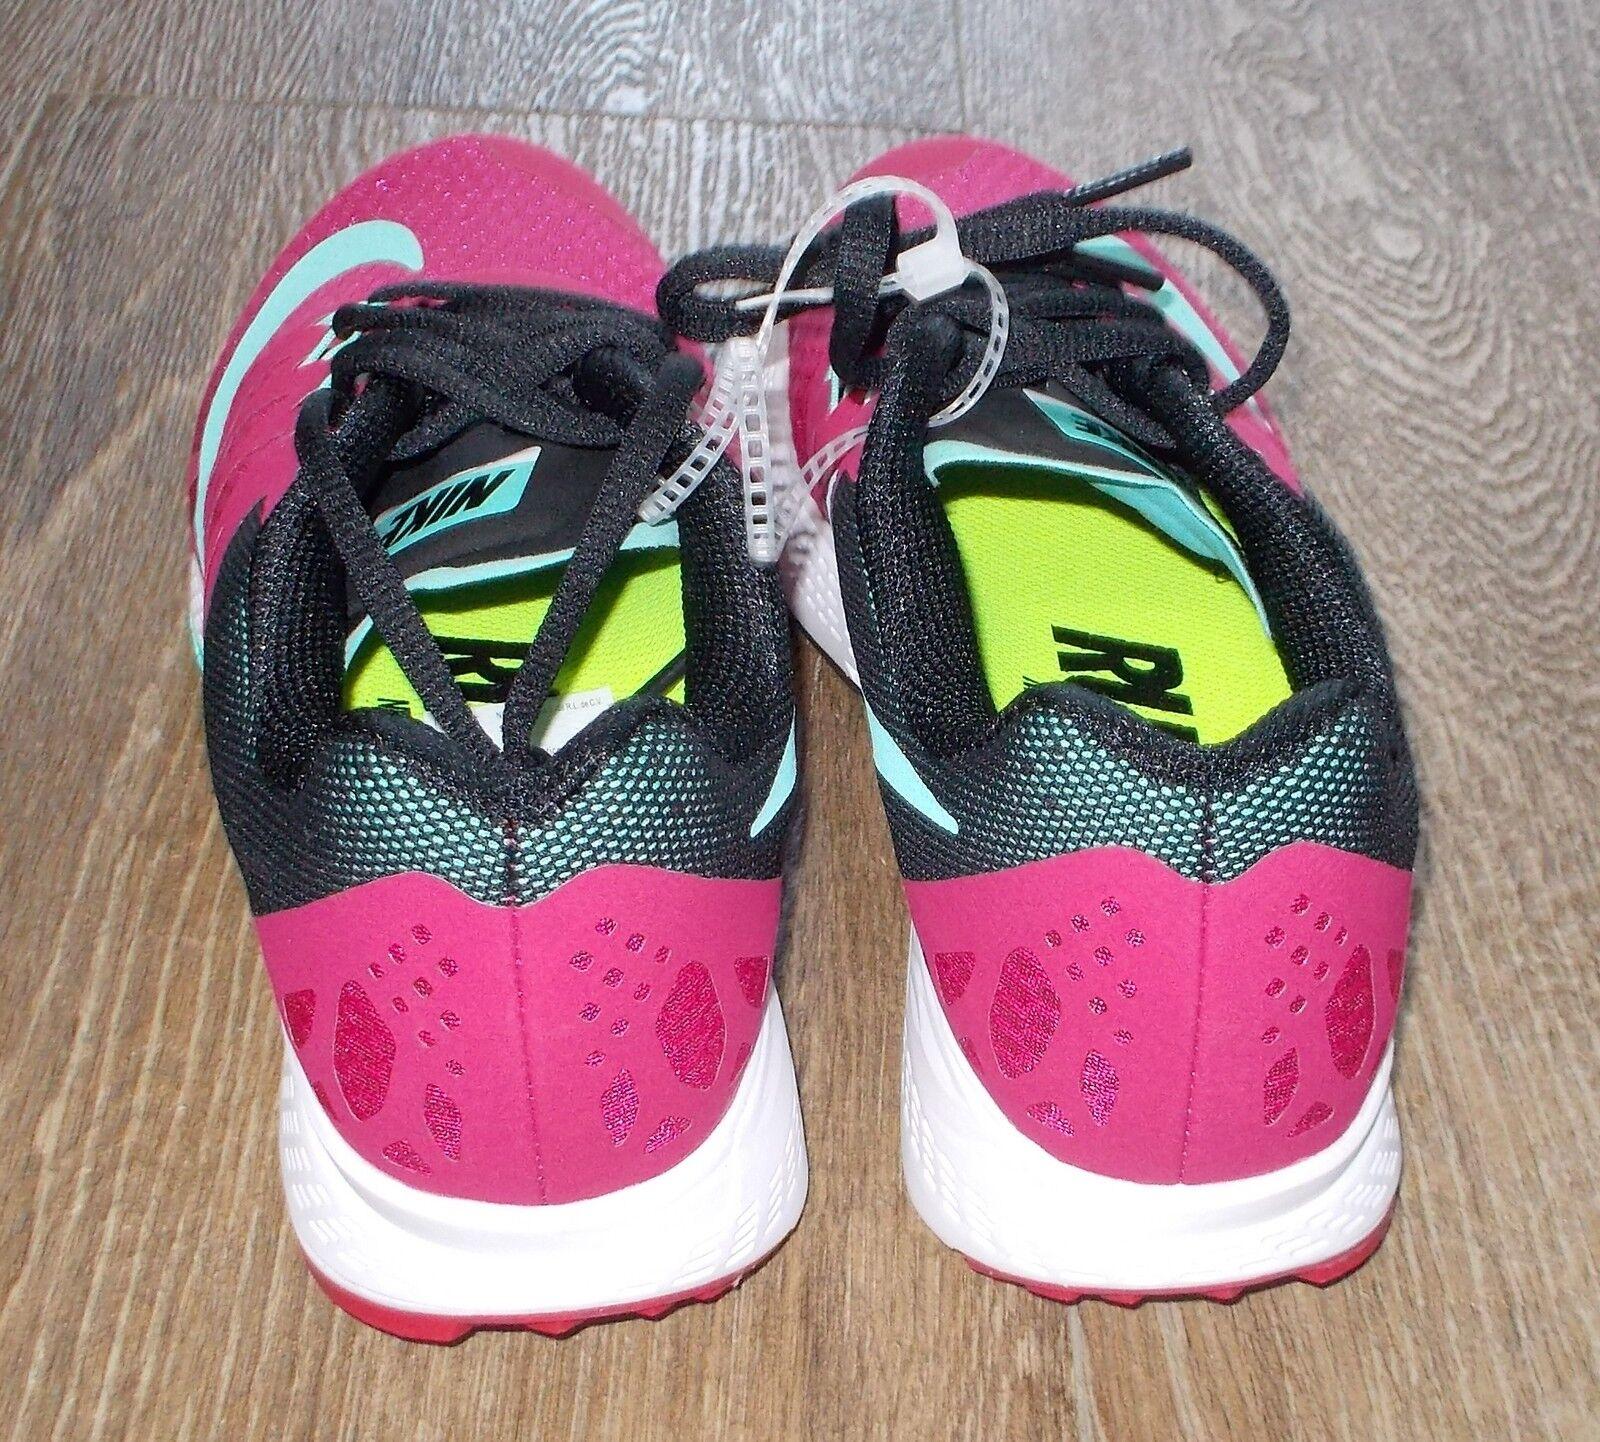 size 40 13f19 5f336 Bbbe7e Zoom Nike 7 Nouvelles 120 Air Femmes lite Limited UqI8CI5wx